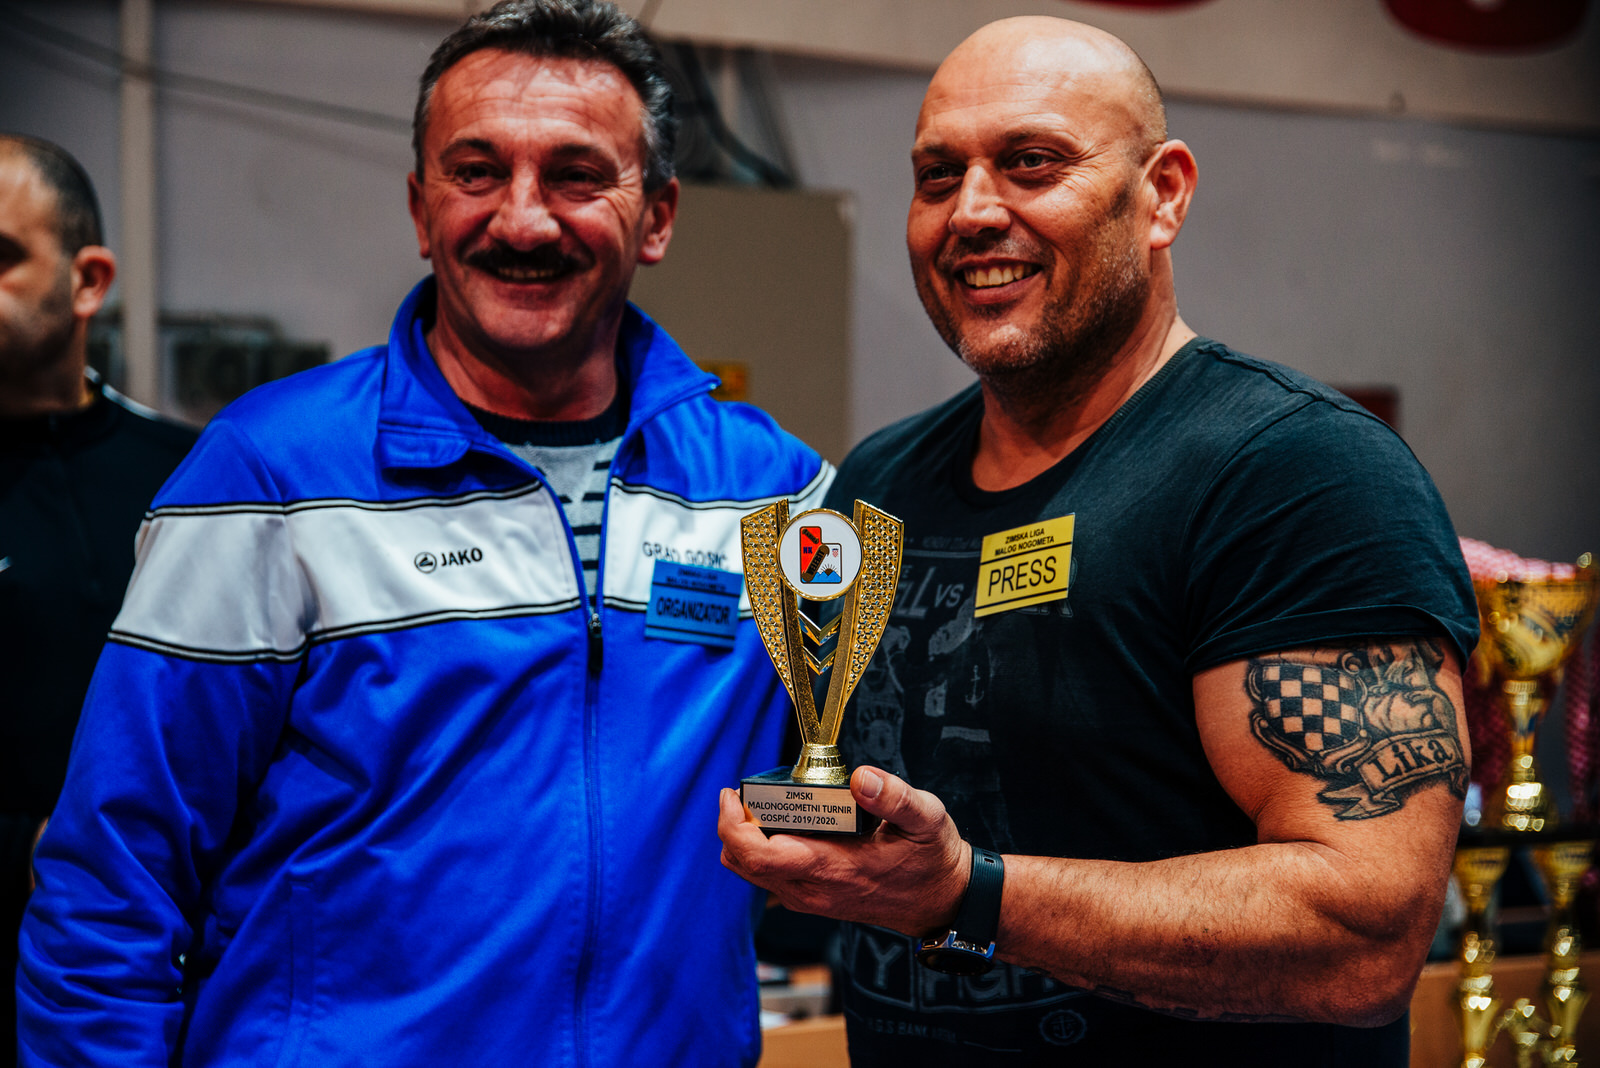 likaclub_zimska-malonogometna-liga-gospić_2019-20-131